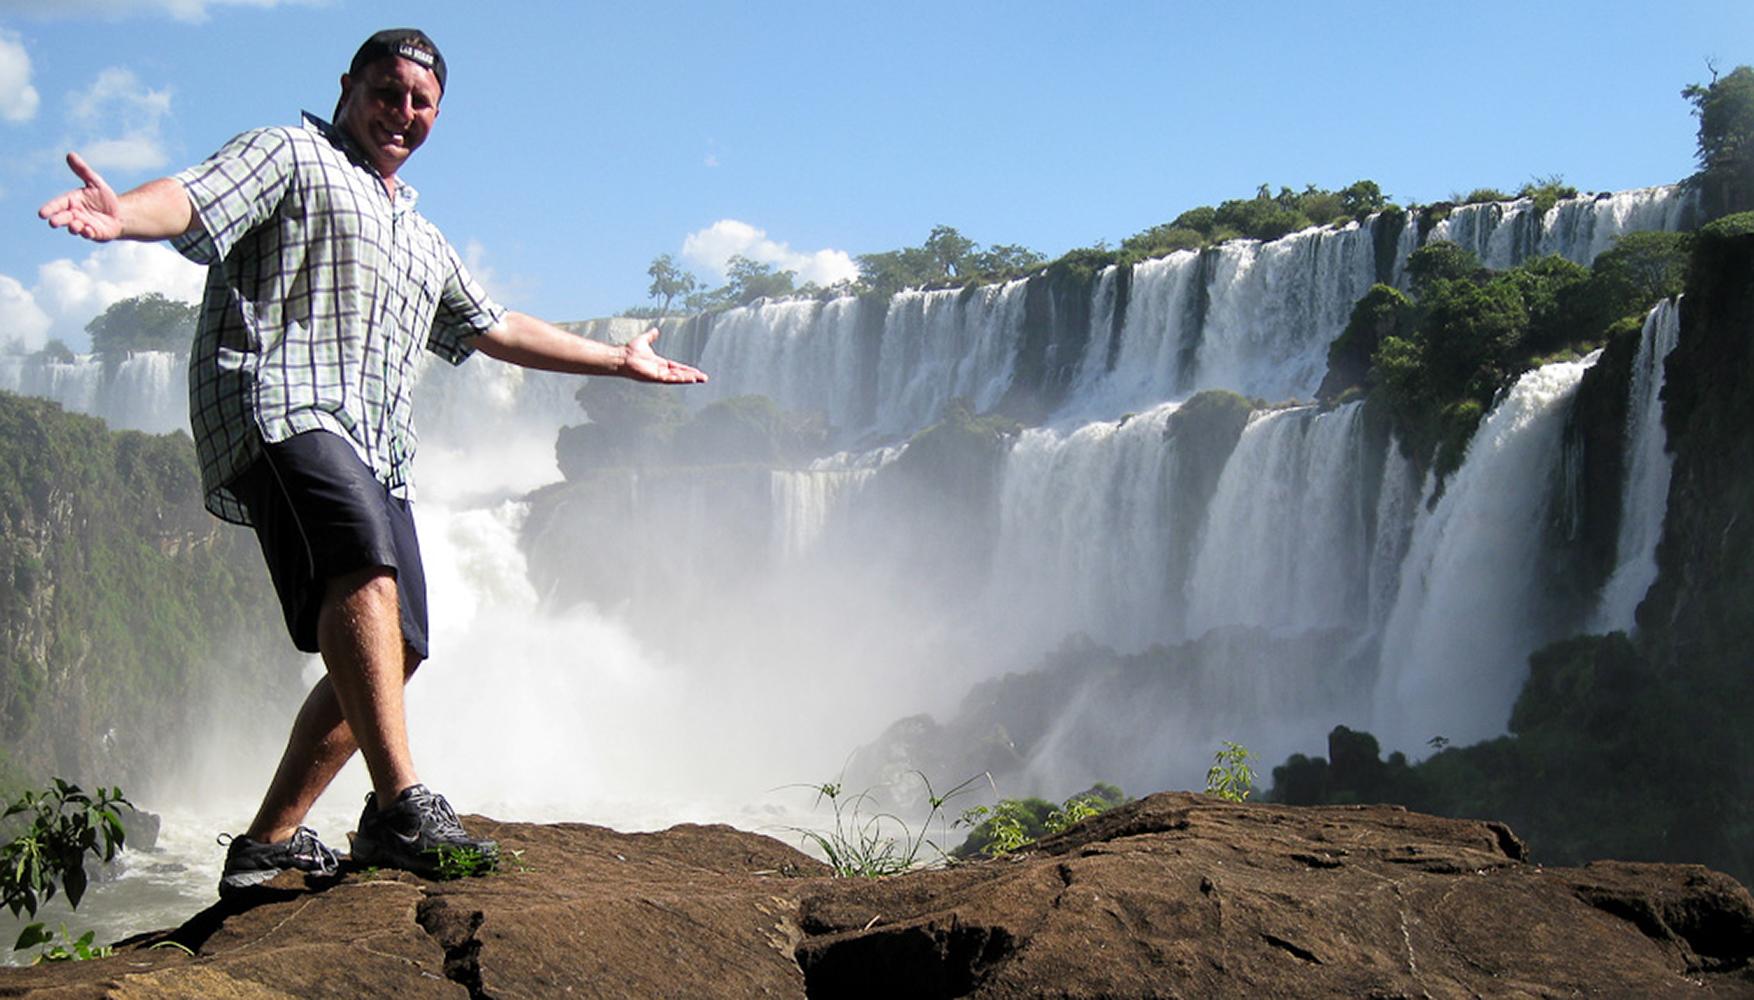 Iguazu Falls, Brazil/Argentina. 275 individual waterfalls and cascades